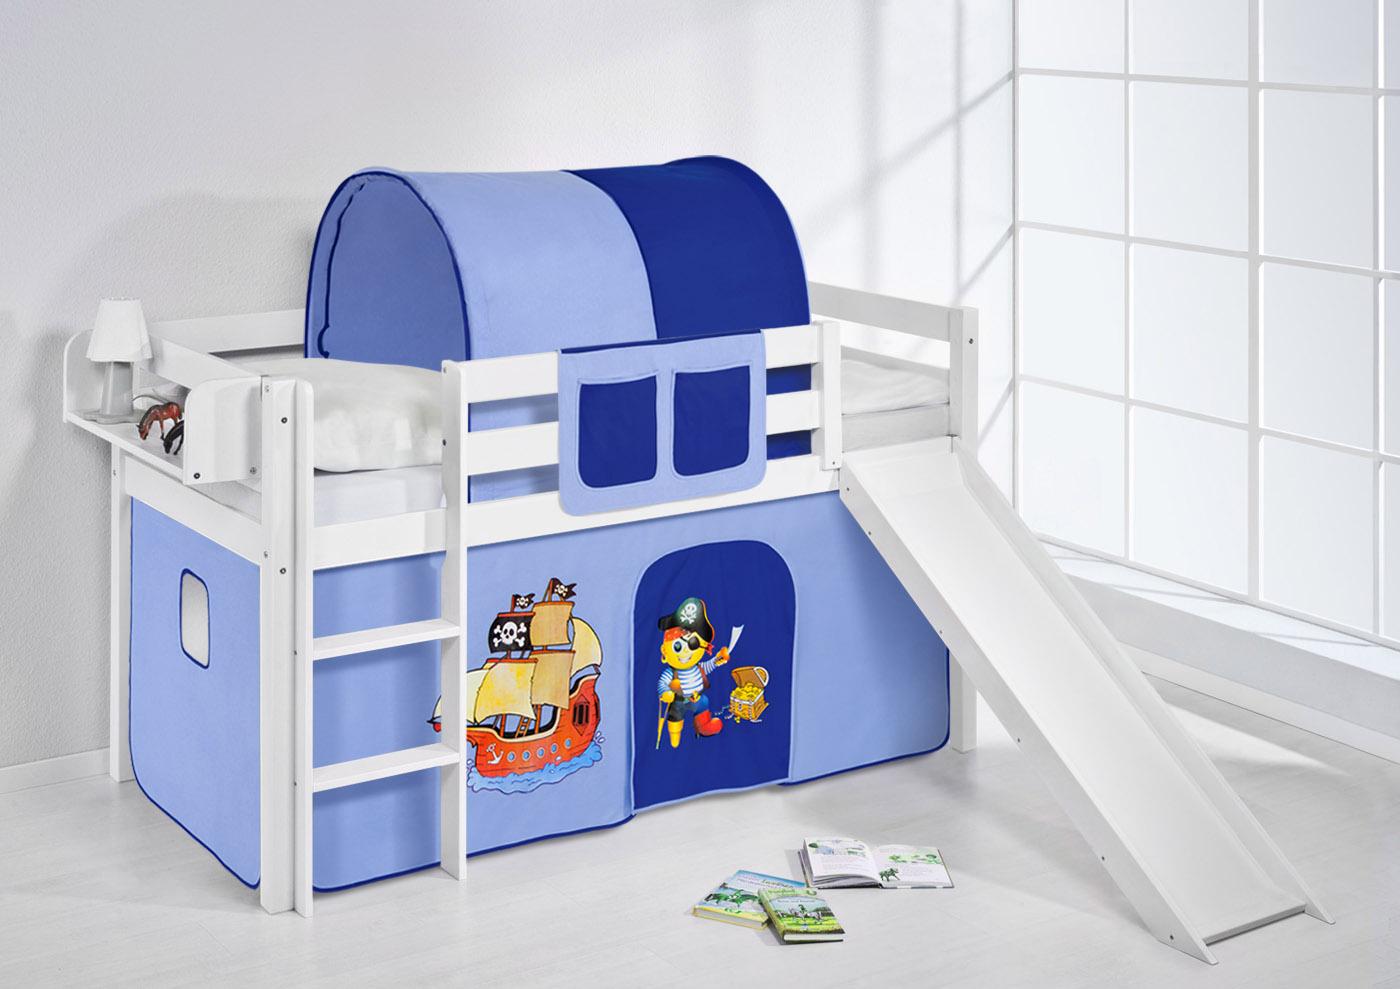 Etagenbett Jelle : Spielbett hochbett kinderbett jelle 190x90 weiss mit rutsche